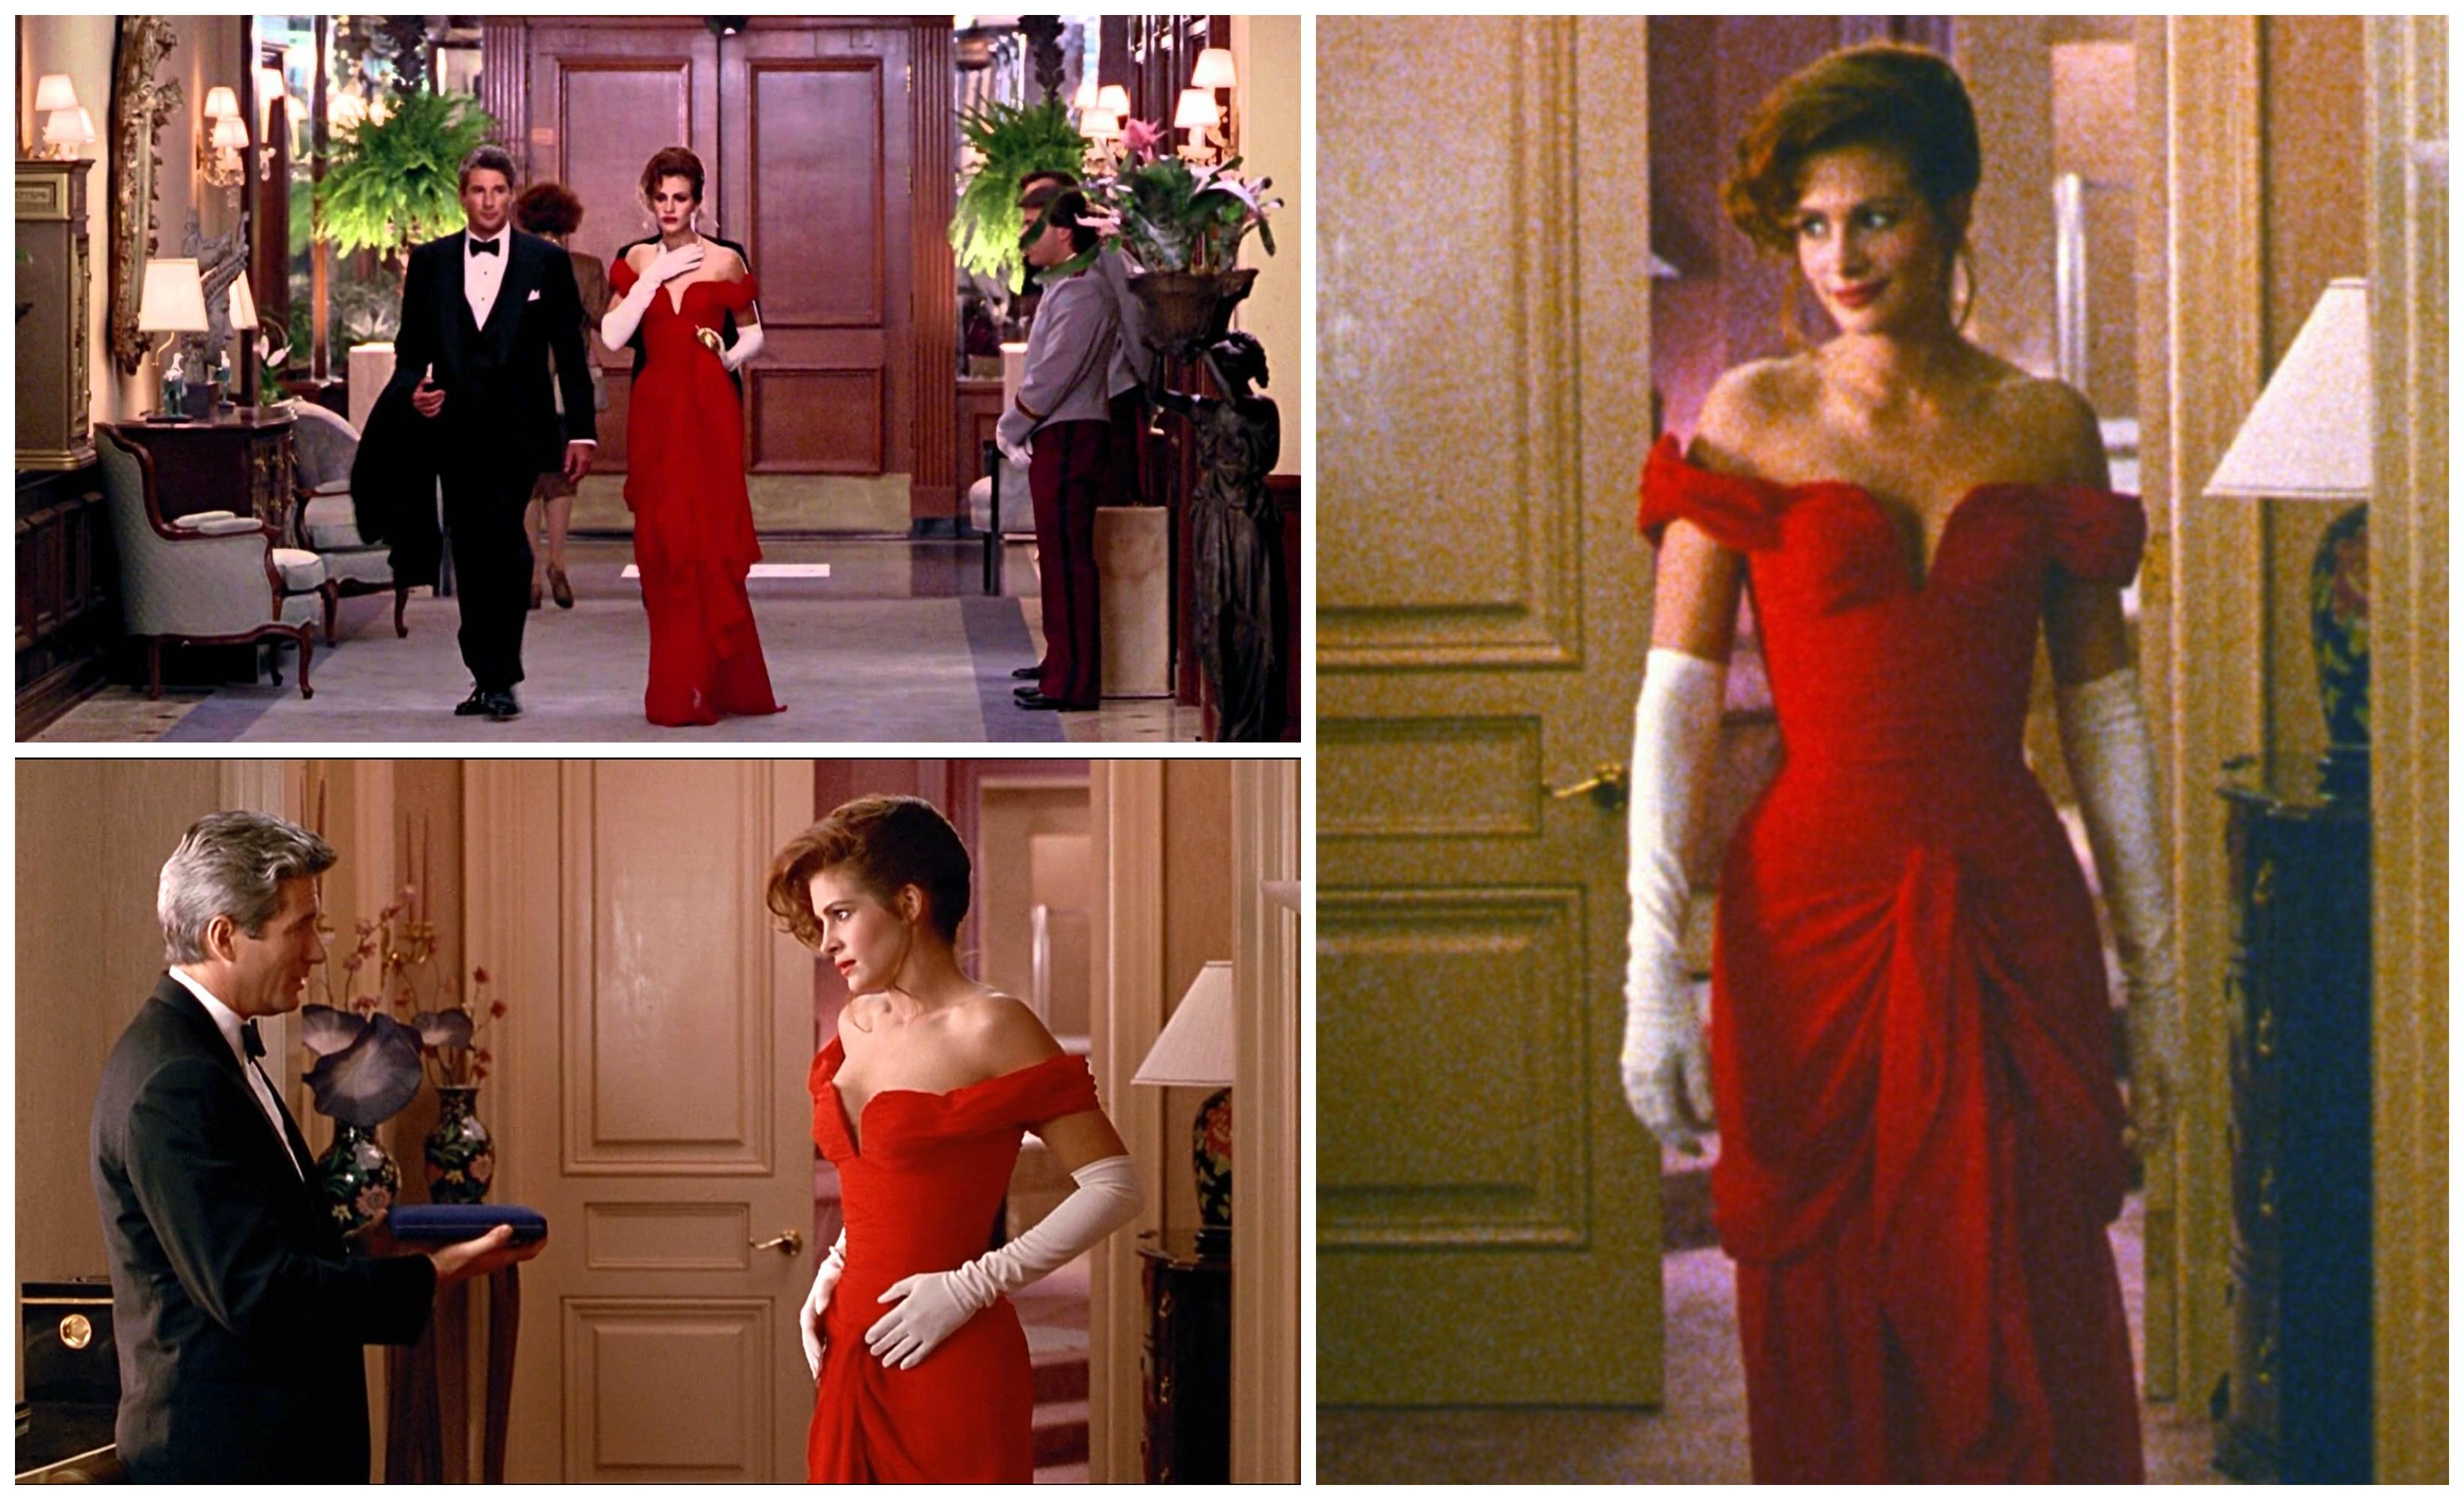 Red opera dress